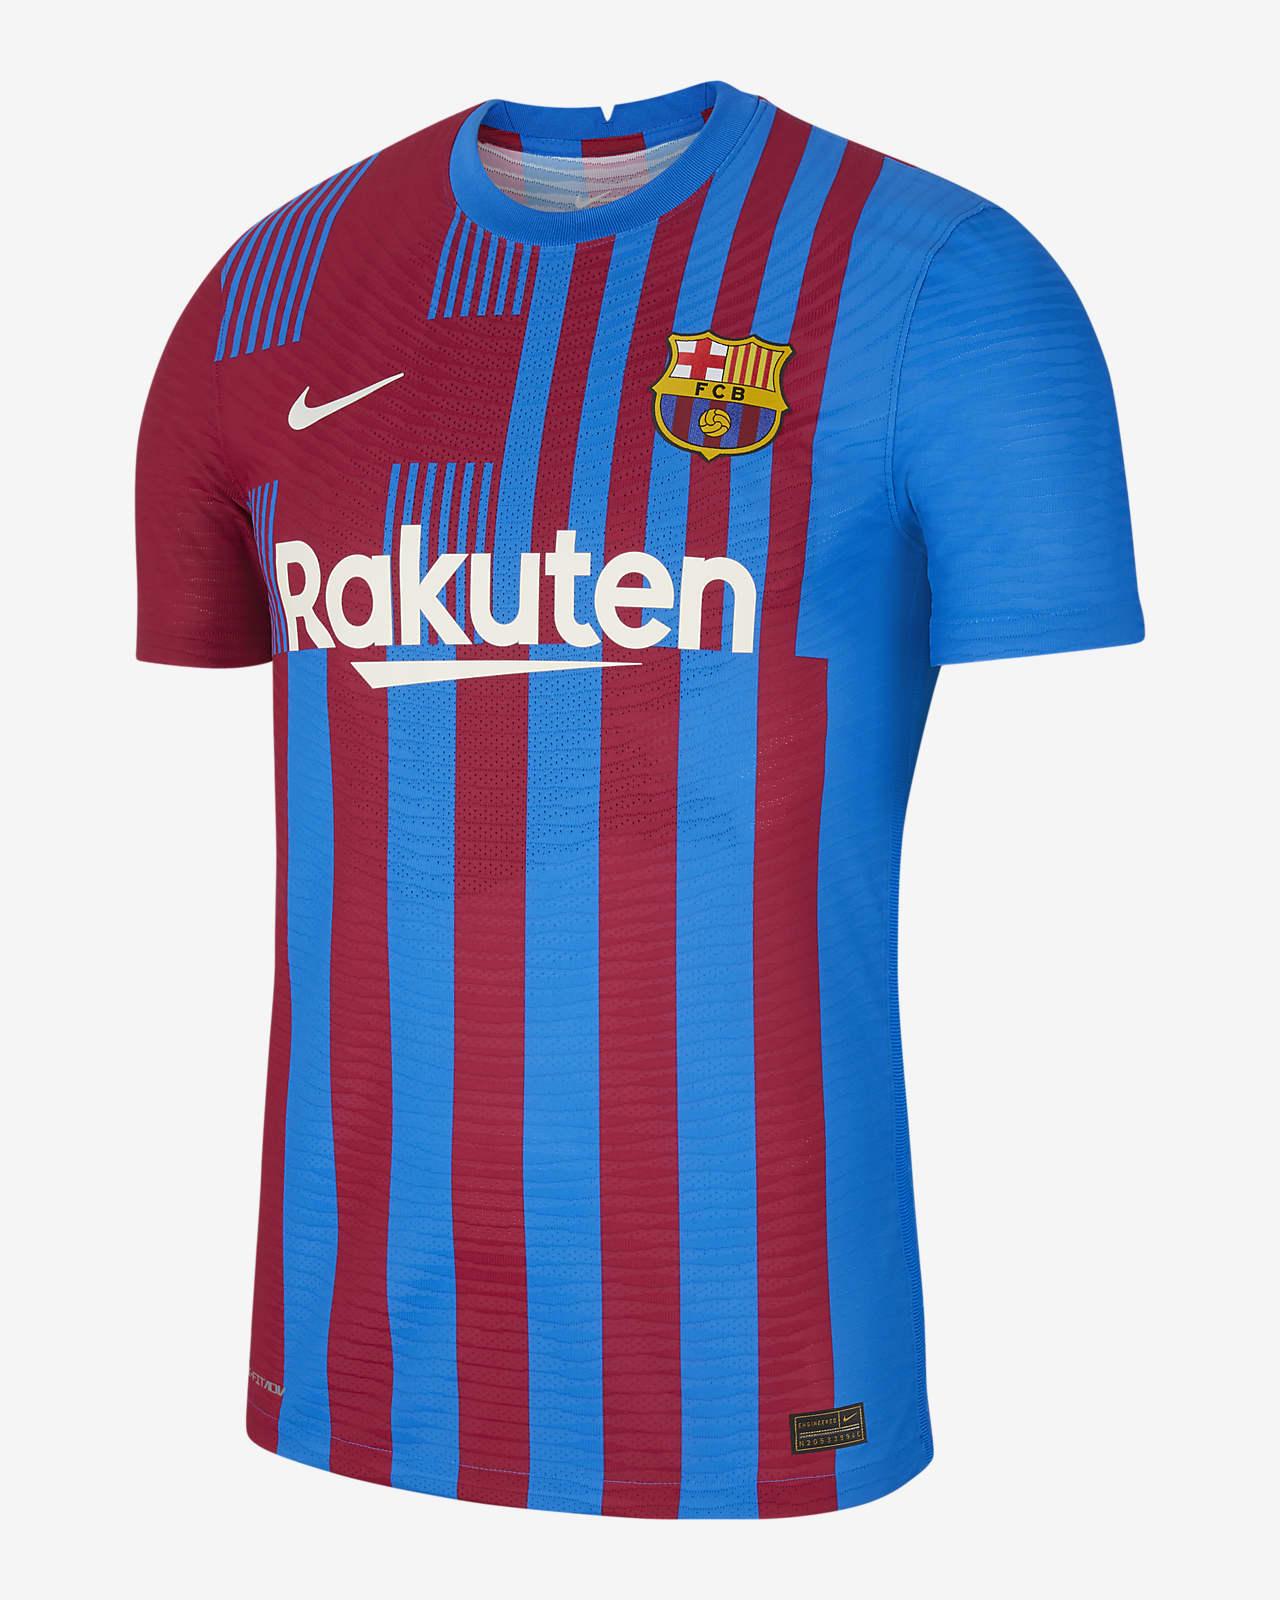 Jersey de fútbol Nike Dri-FIT ADV del FC Barcelona local 2020/2021 Match para hombre